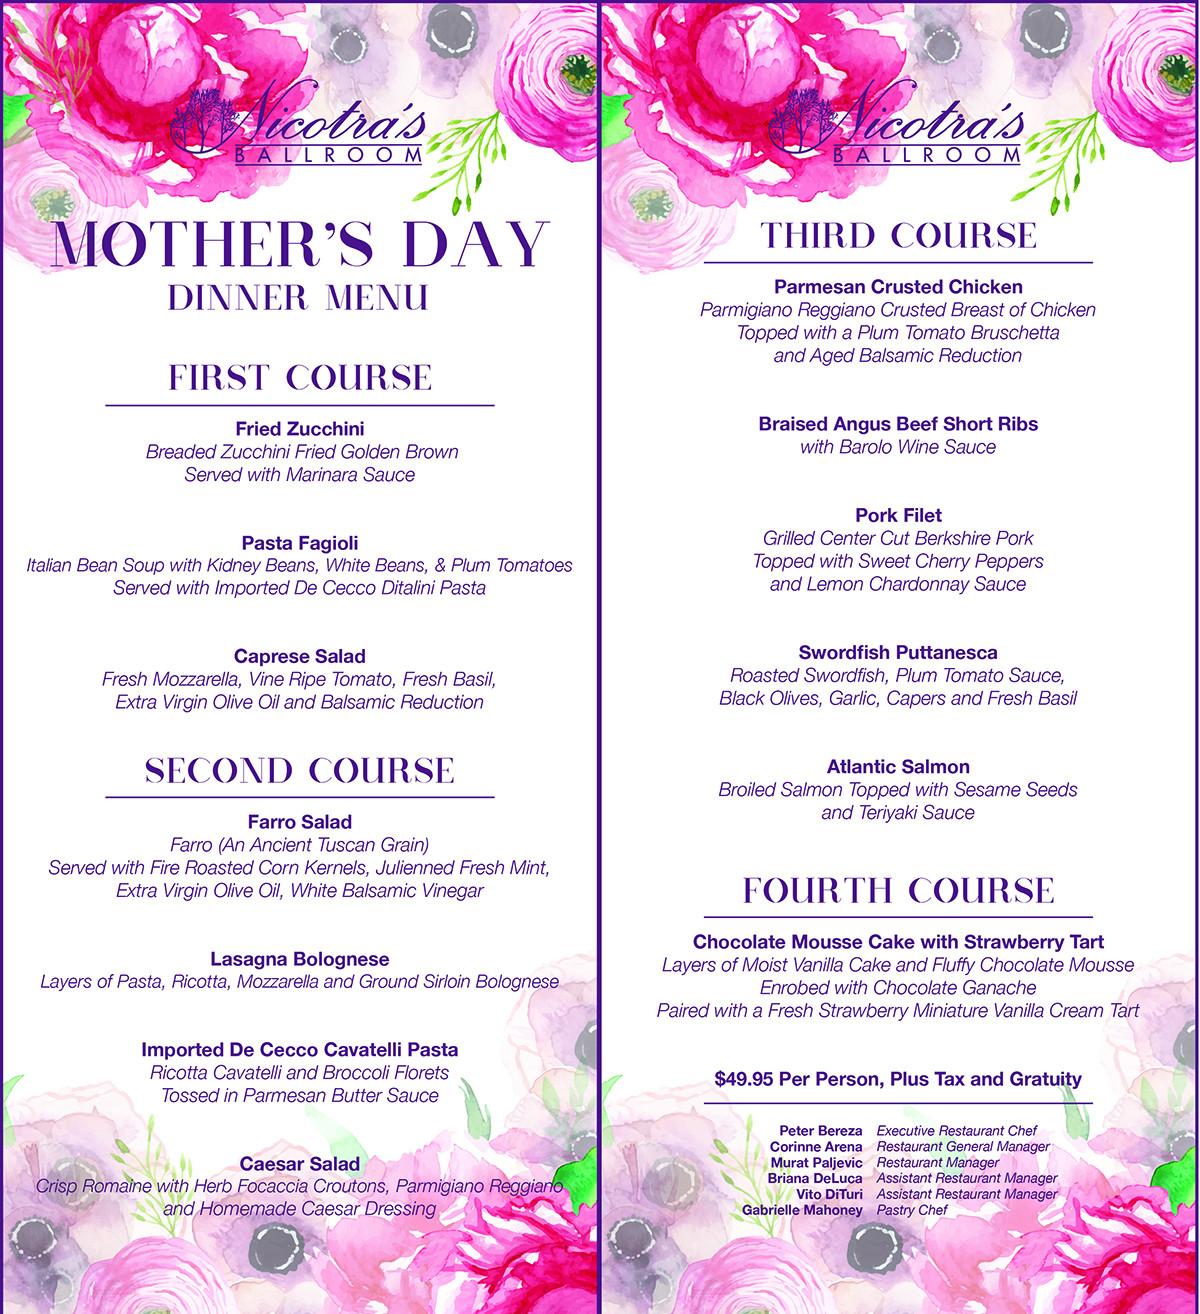 Mothers Day Dinner Menus  Mother s Day Lorenzo's Restaurant Bar & Cabaret